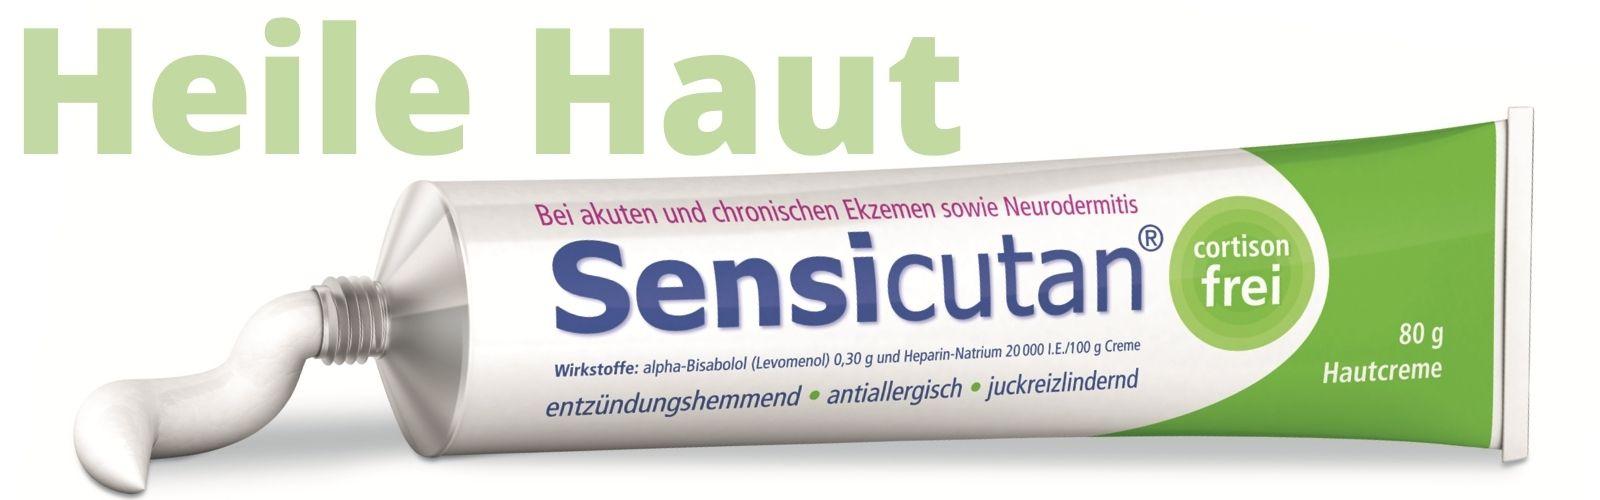 Sensicutan Creme für heile Haut